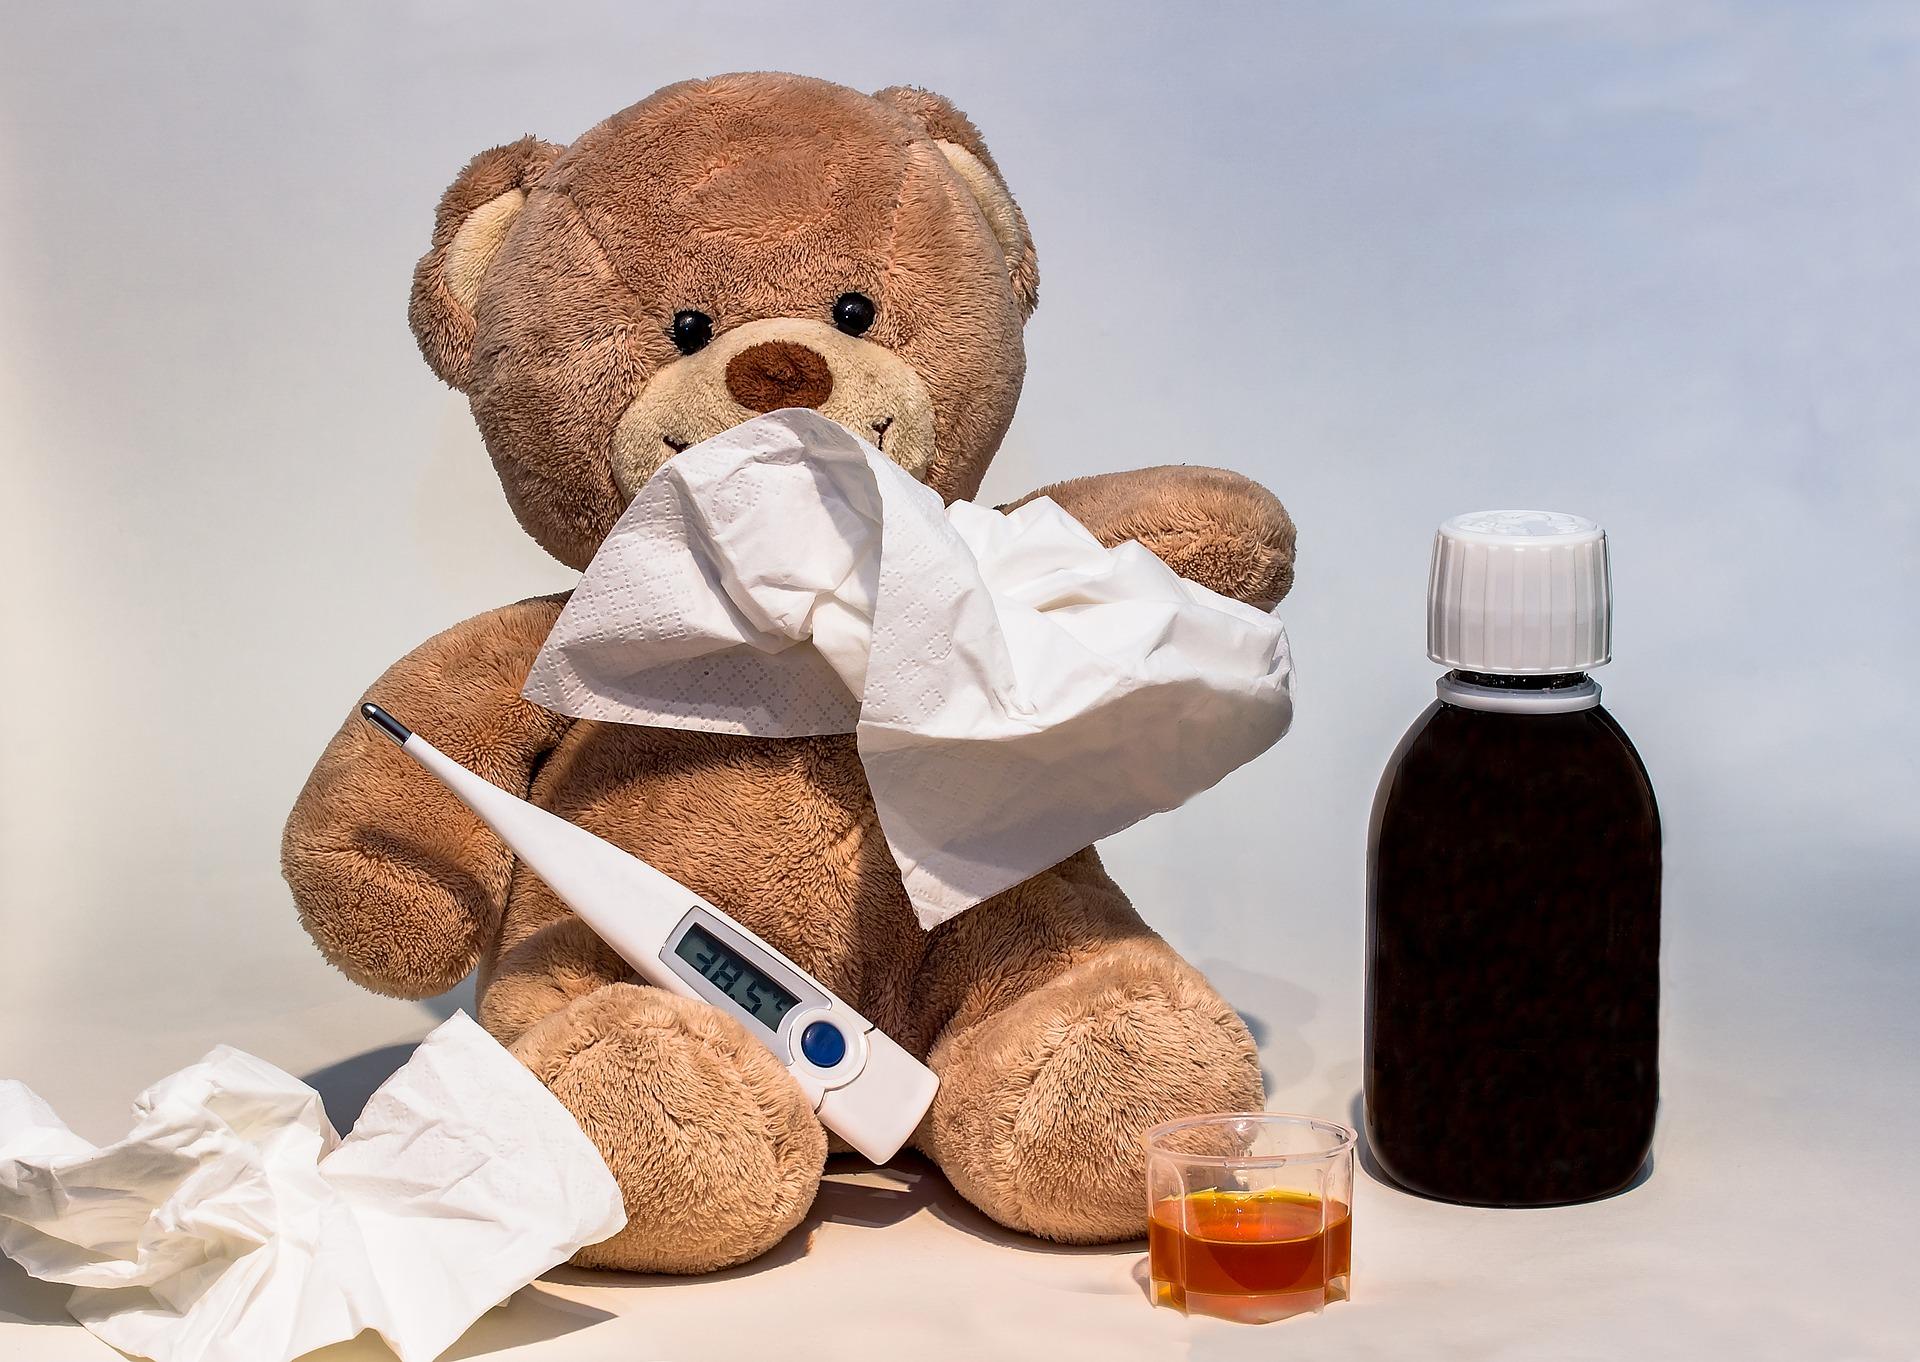 Prehlada Temperatura djecja bolest